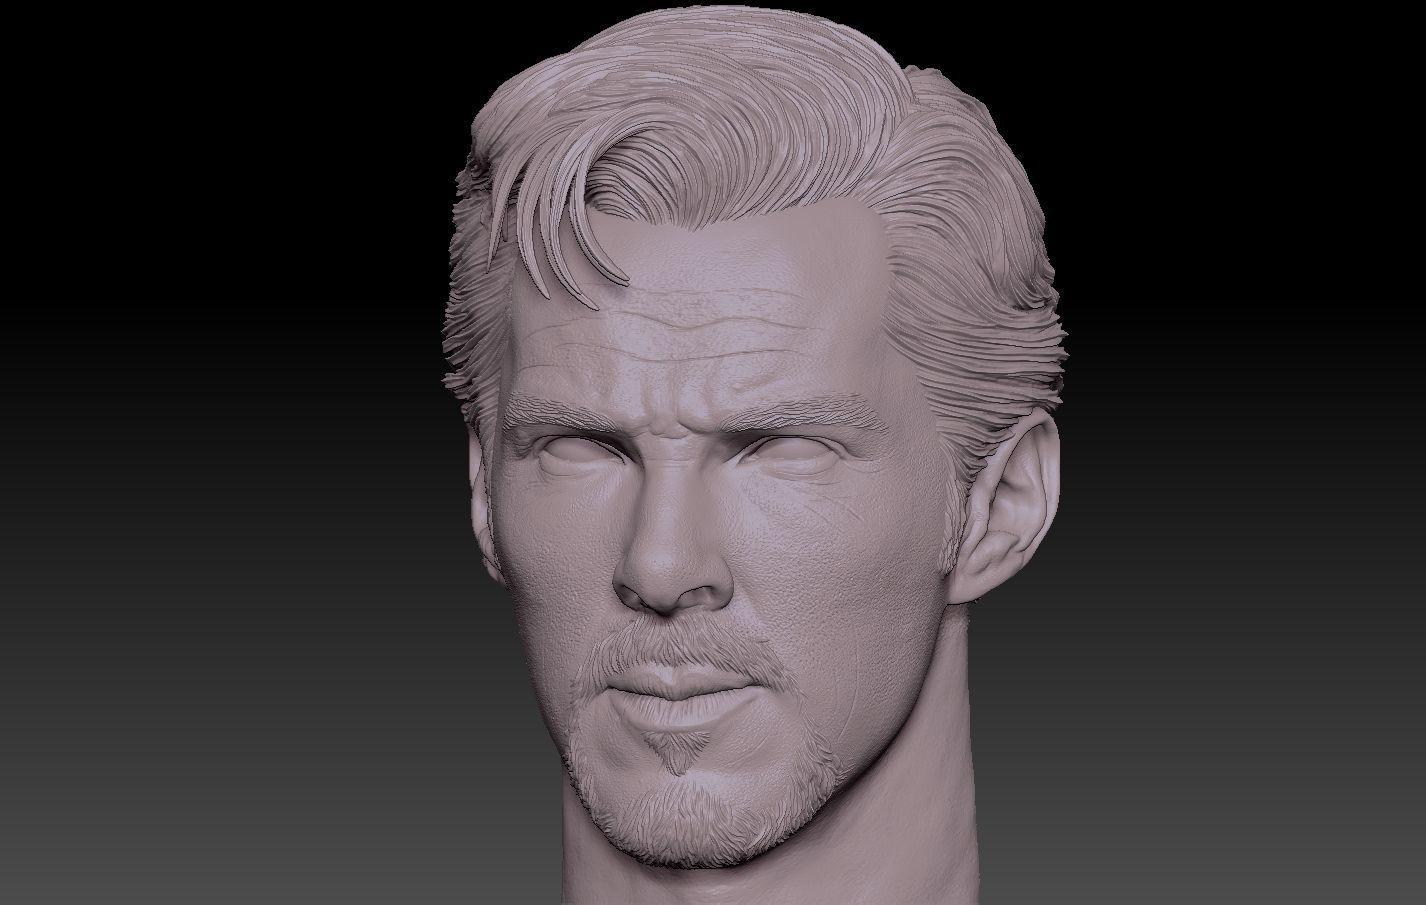 Doctor Strange head Benedict Cumberbatch